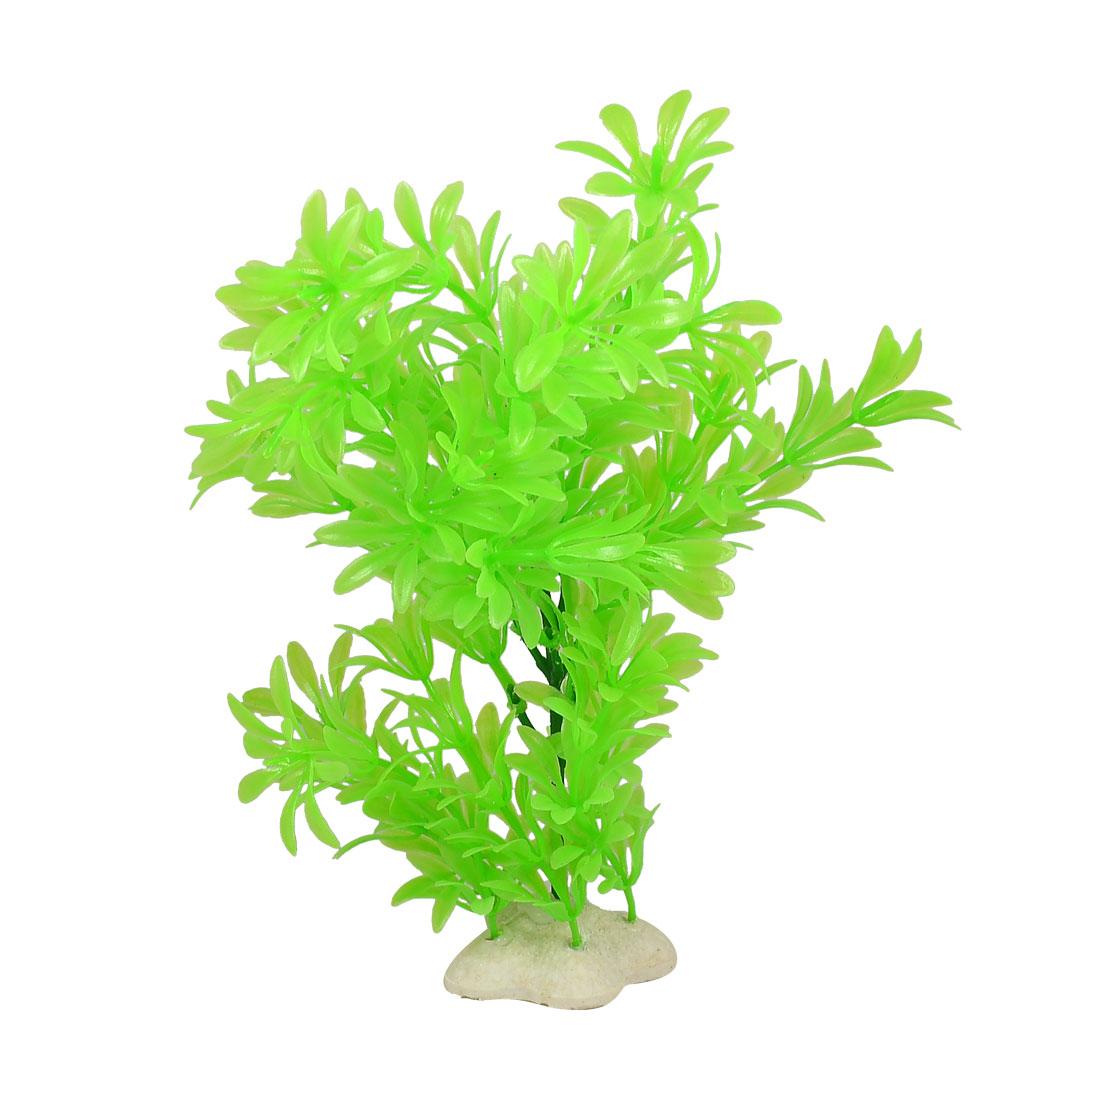 "Fish Tank Decoration 10"" Height Light Green Leaf Plastic Aquatic Plant"